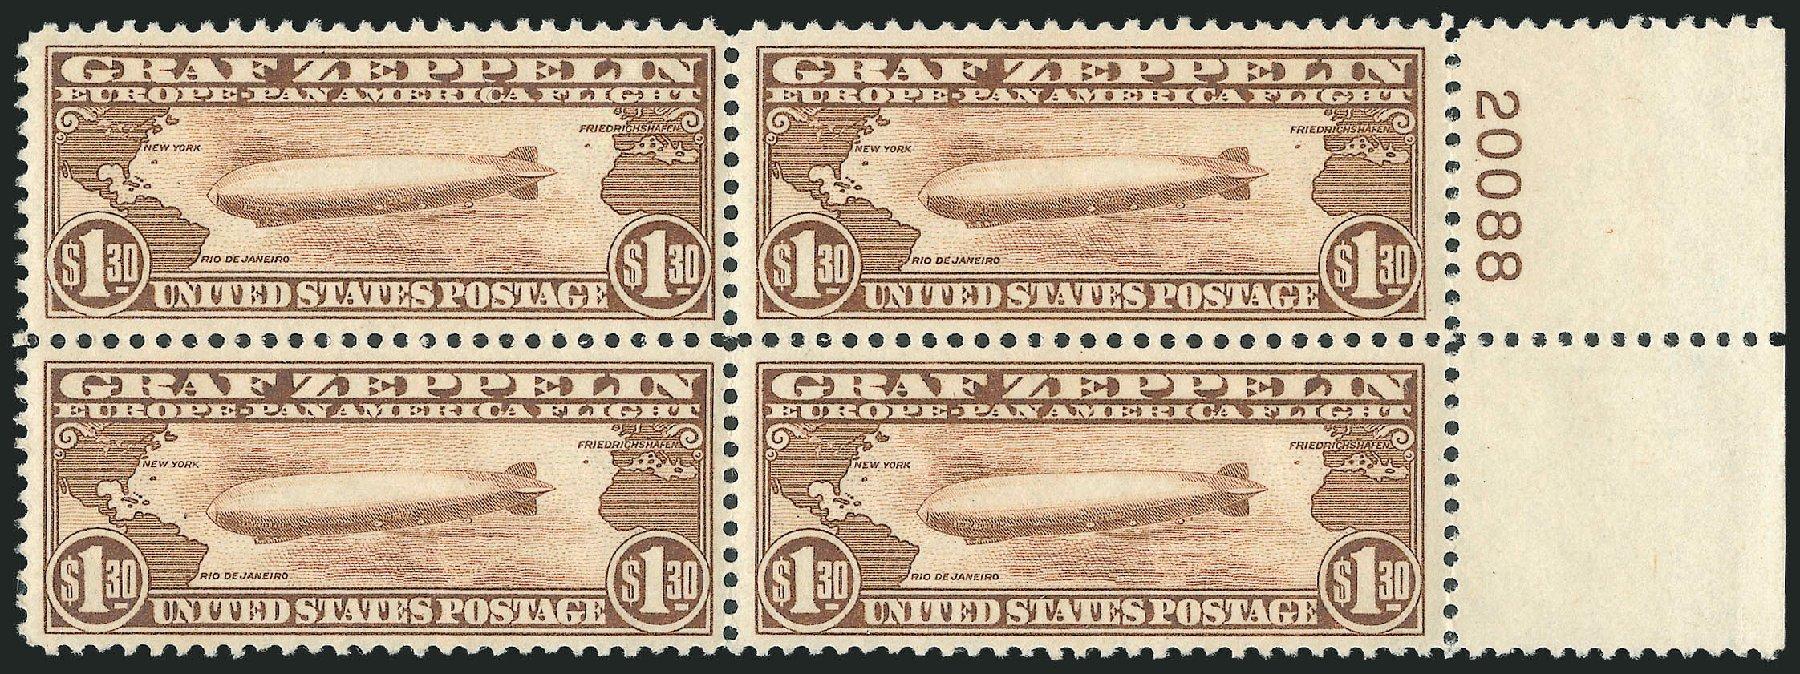 Price of US Stamps Scott #C14: 1930 US$1.30 Air Graf Zeppelin. Robert Siegel Auction Galleries, Dec 2014, Sale 1090, Lot 1614